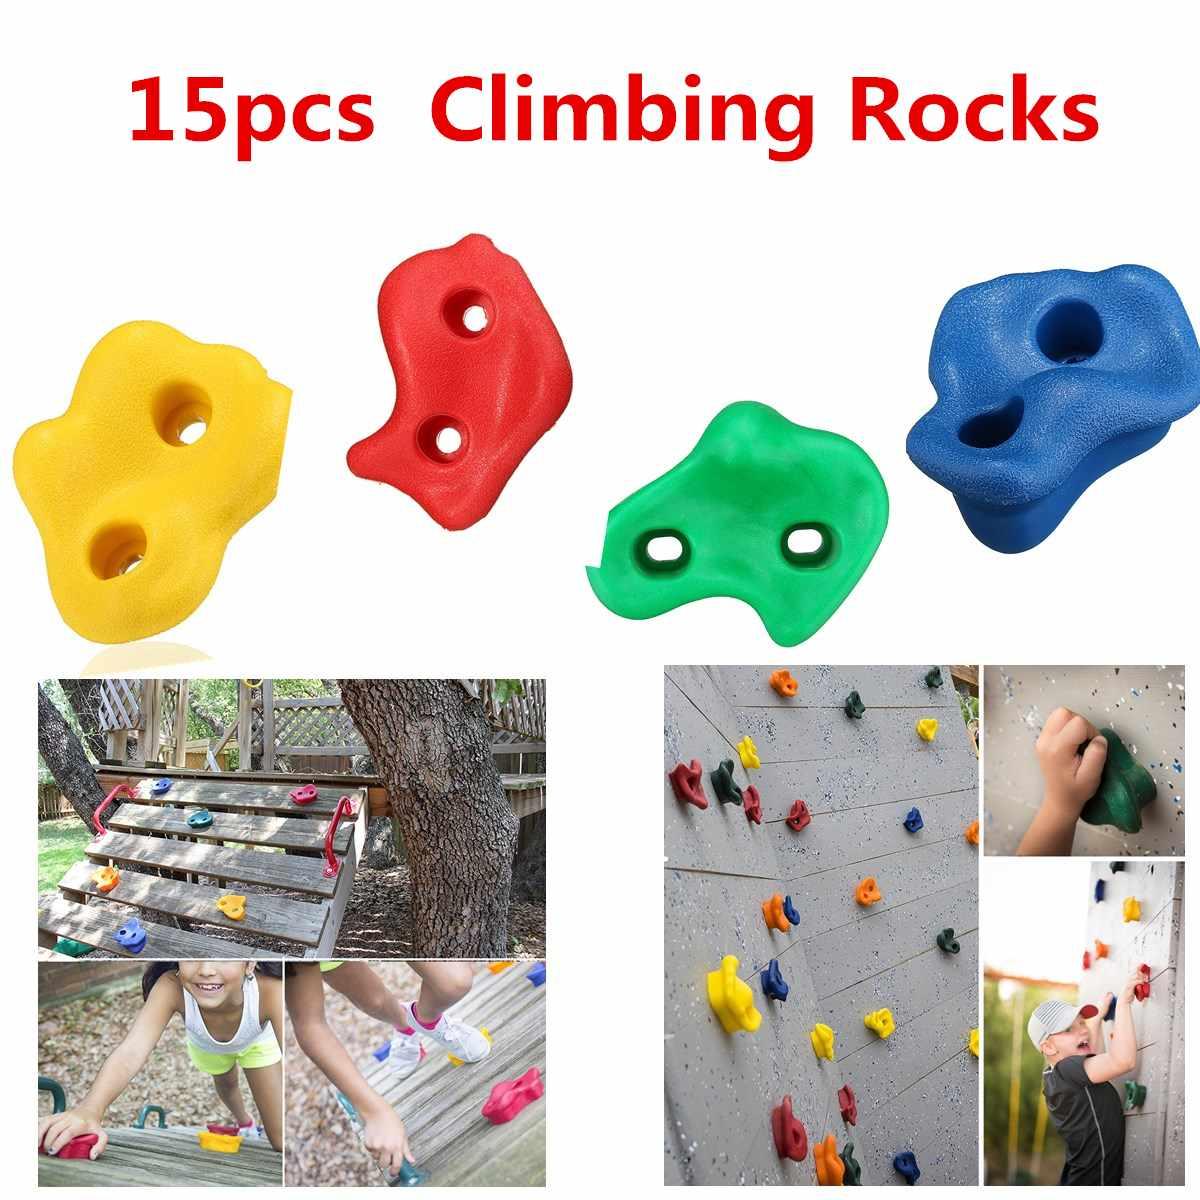 15Pcs Plastic Children Kids Rock Climbing Wood Wall Stones Hand Feet Holds Grip Kits Without Screws Random Color & Shape